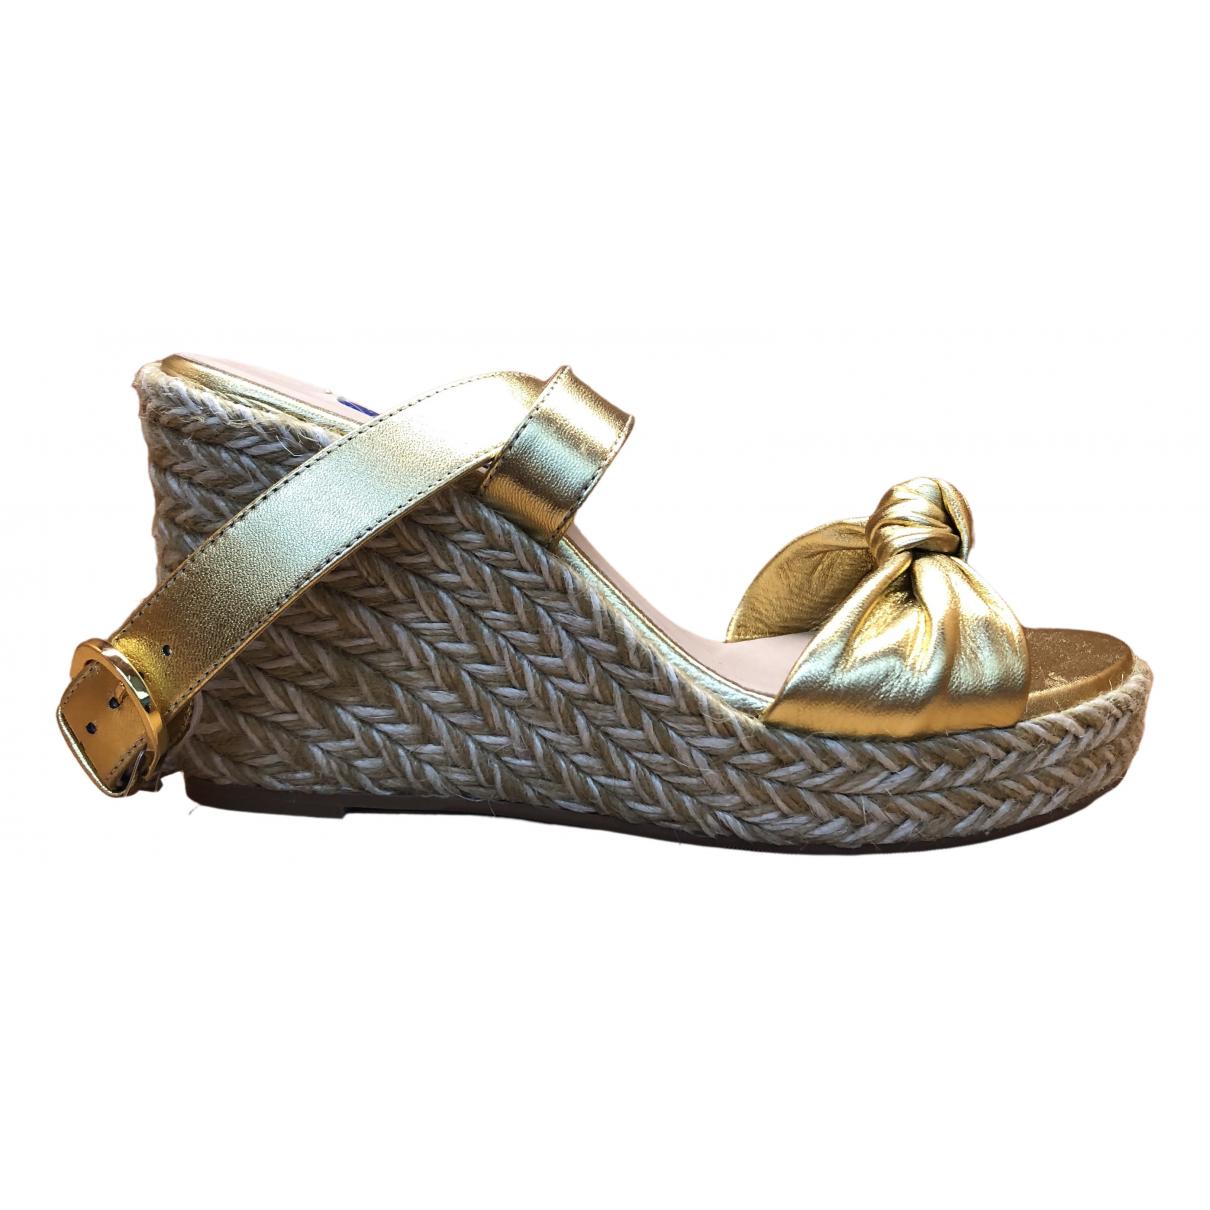 Stuart Weitzman \N Gold Leather Sandals for Women 36 EU